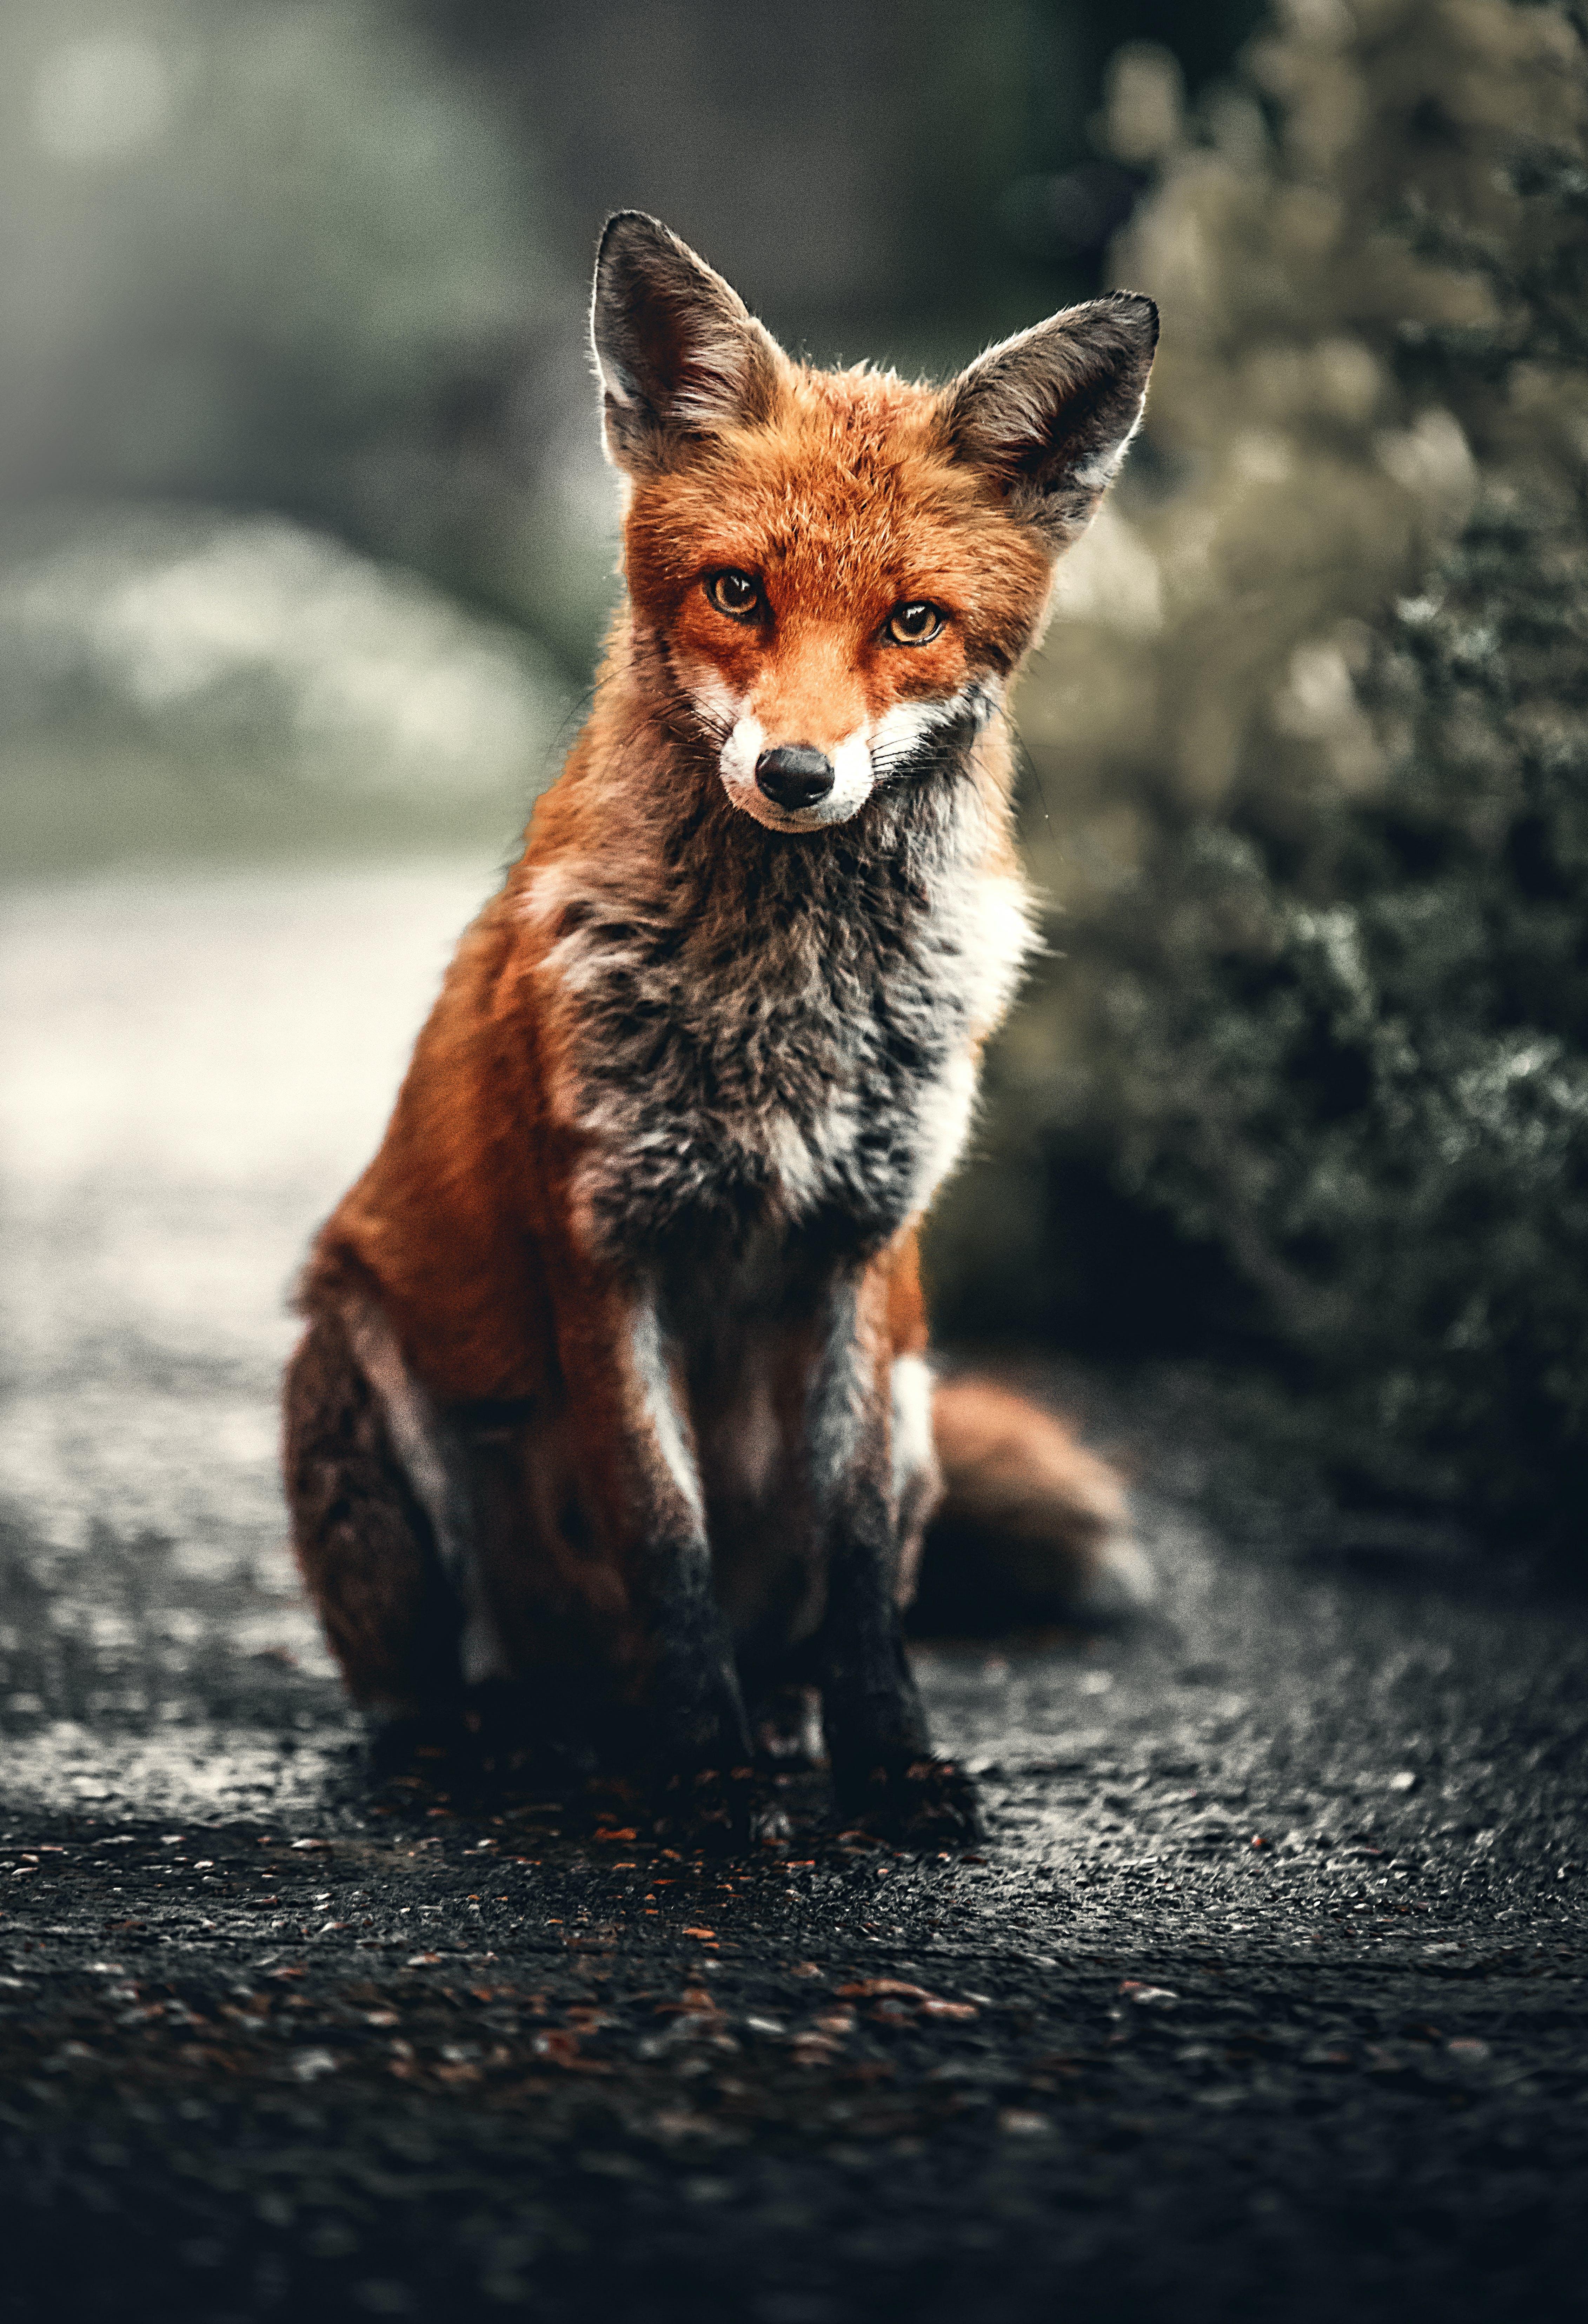 Photo of Fox Sitting On Ground